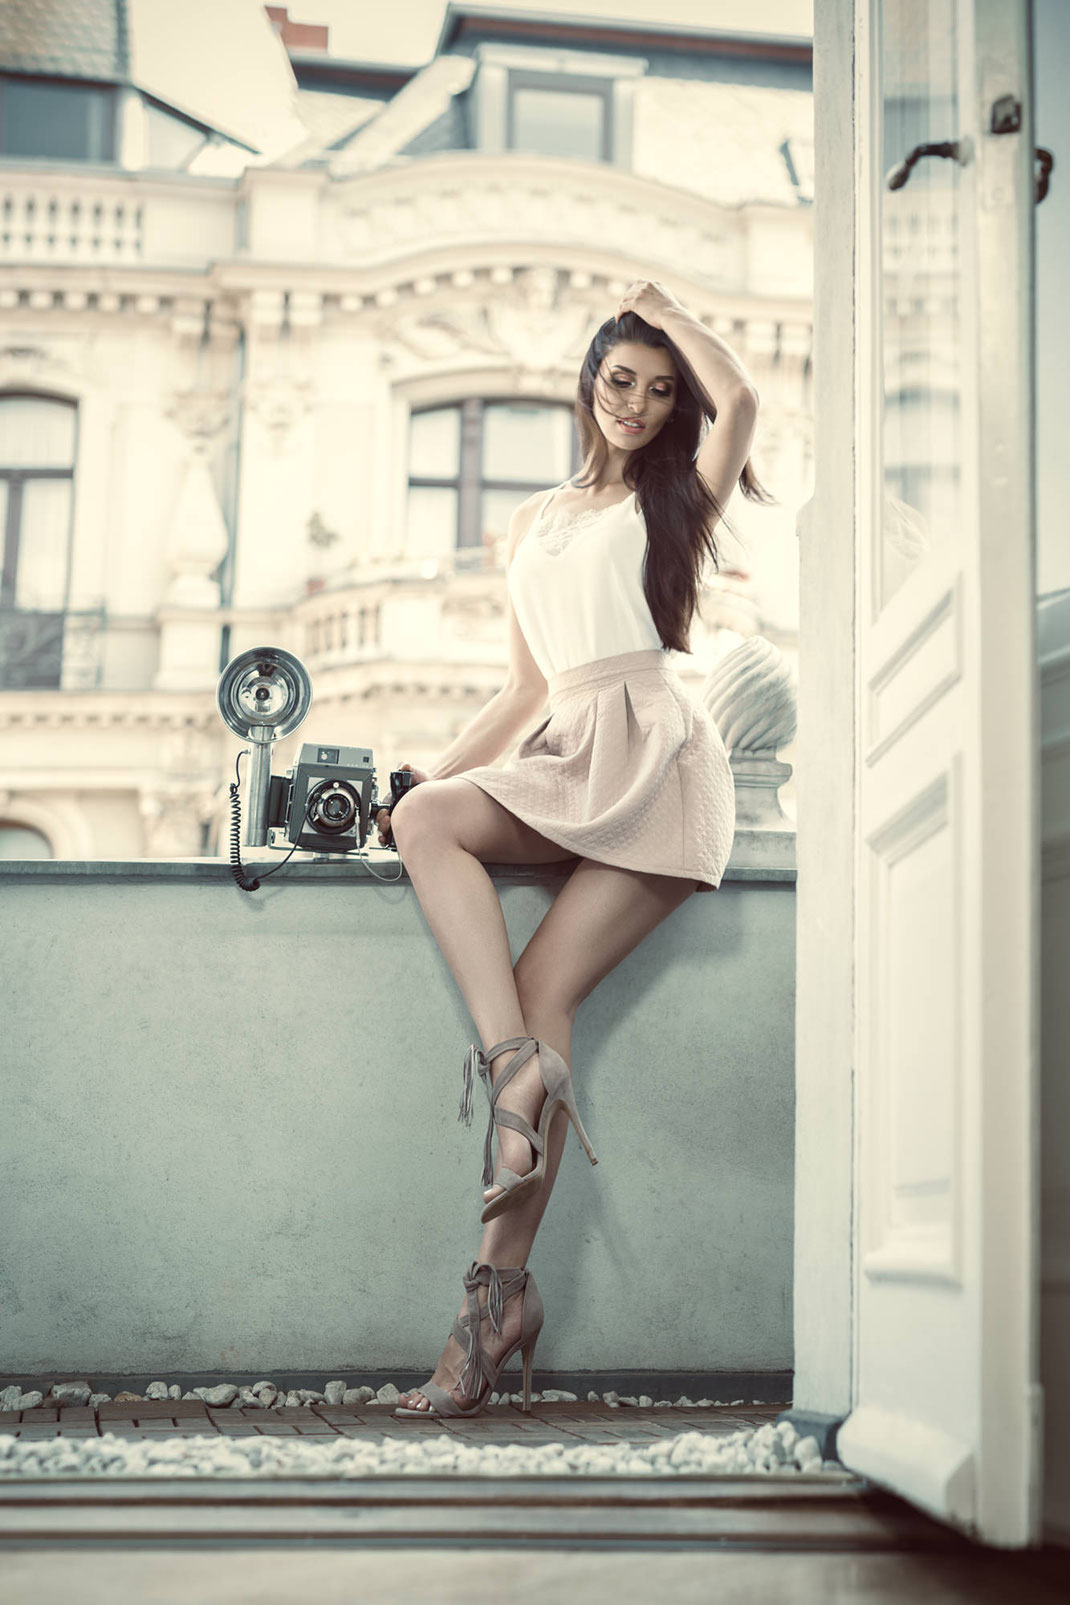 Two Beauties - Liuba & Mamiya Press 23 - Markus Hertzsch - Camera - Girl - Fashion